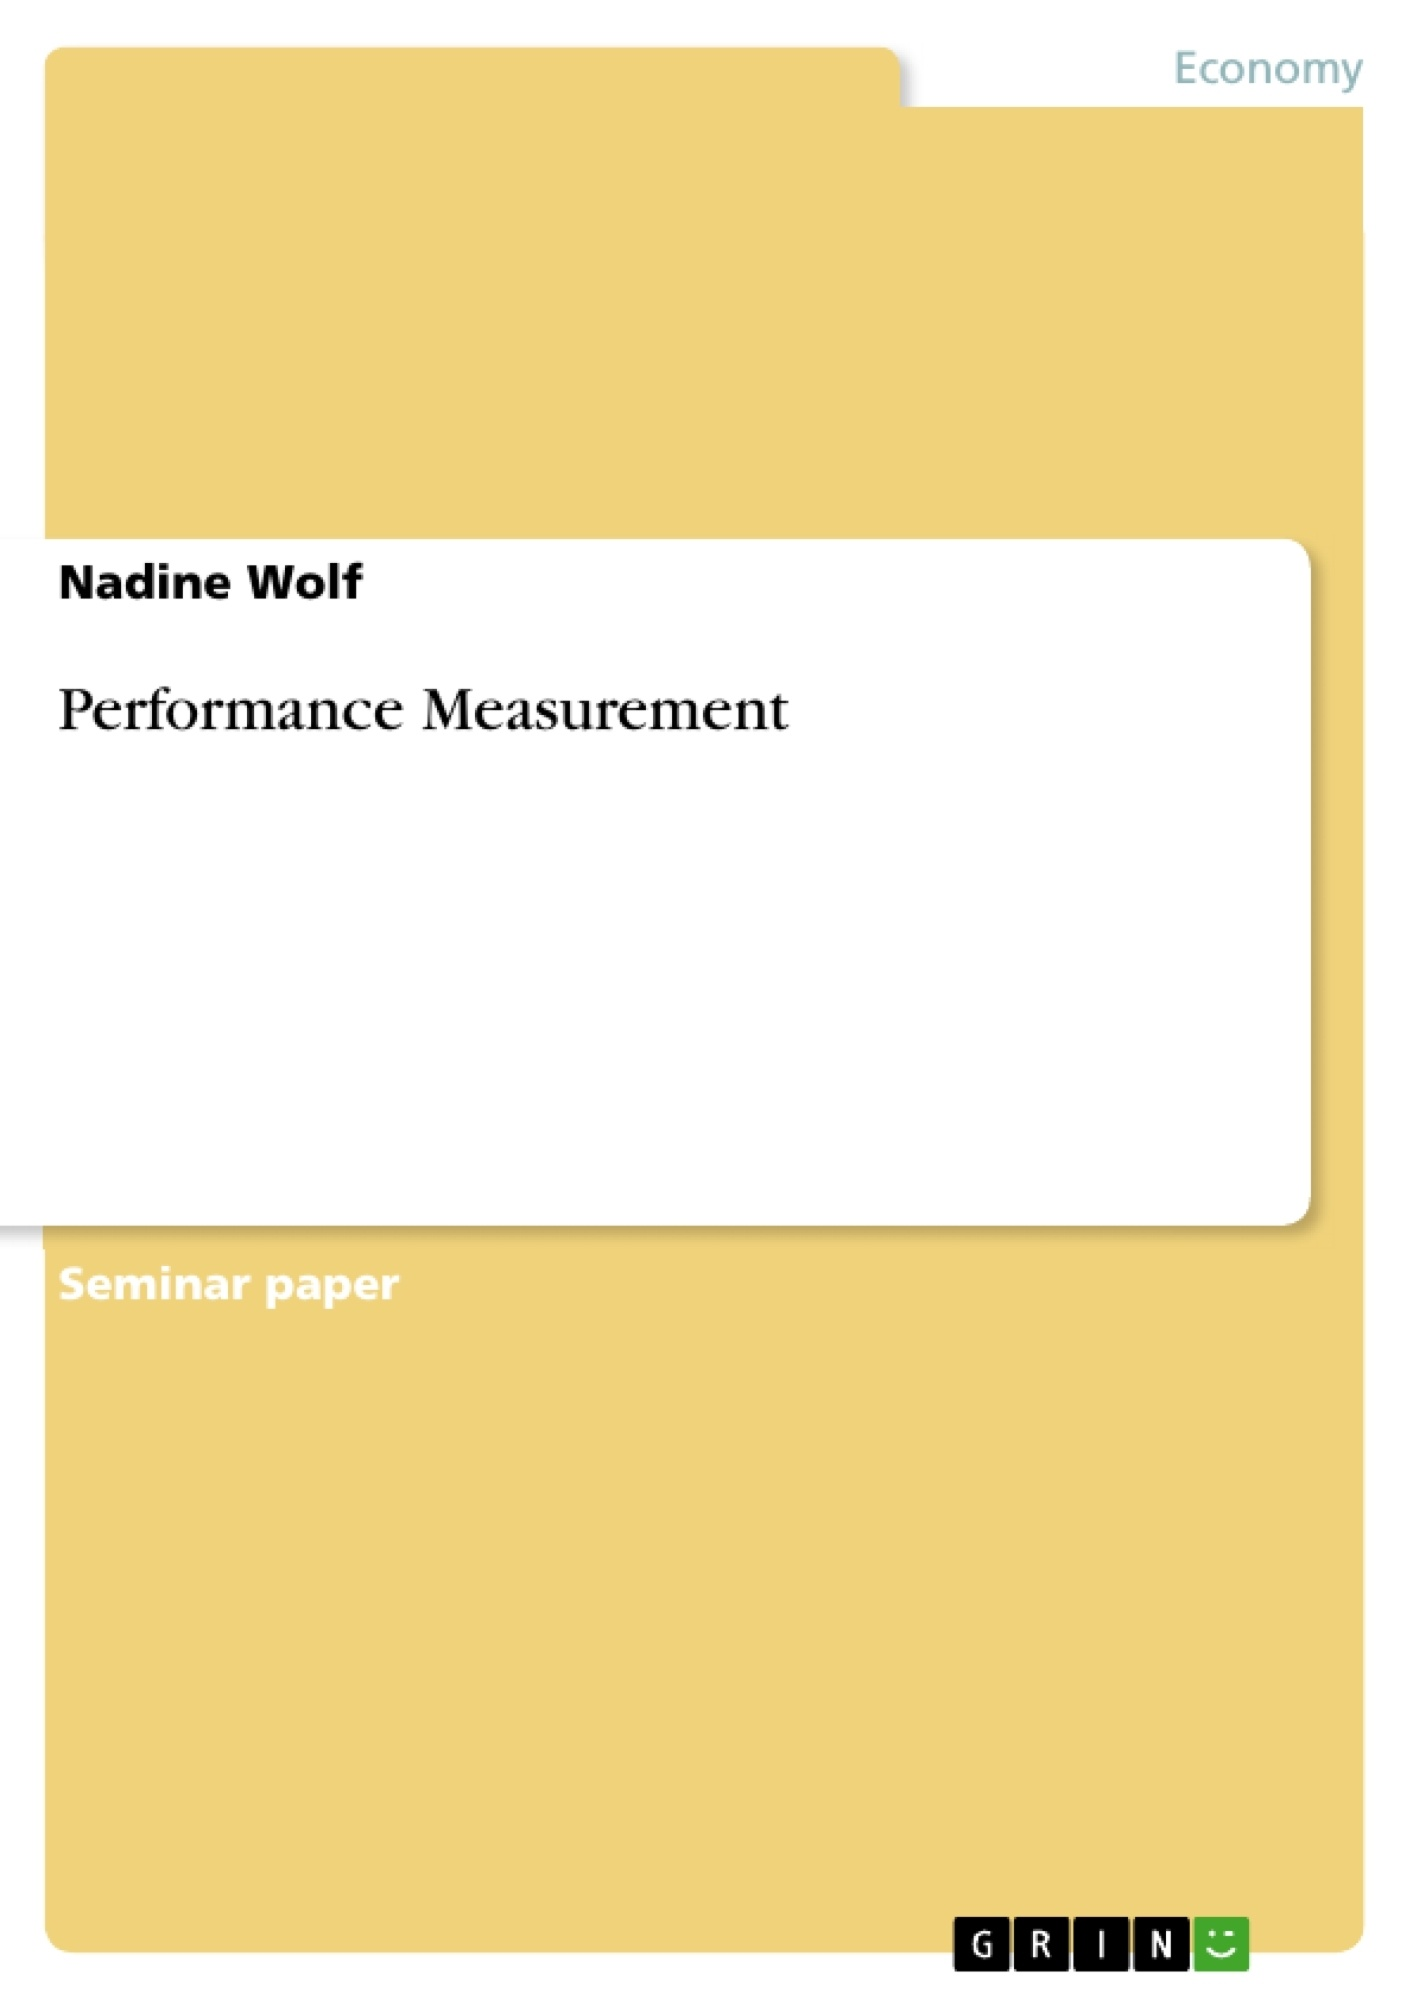 Title: Performance Measurement